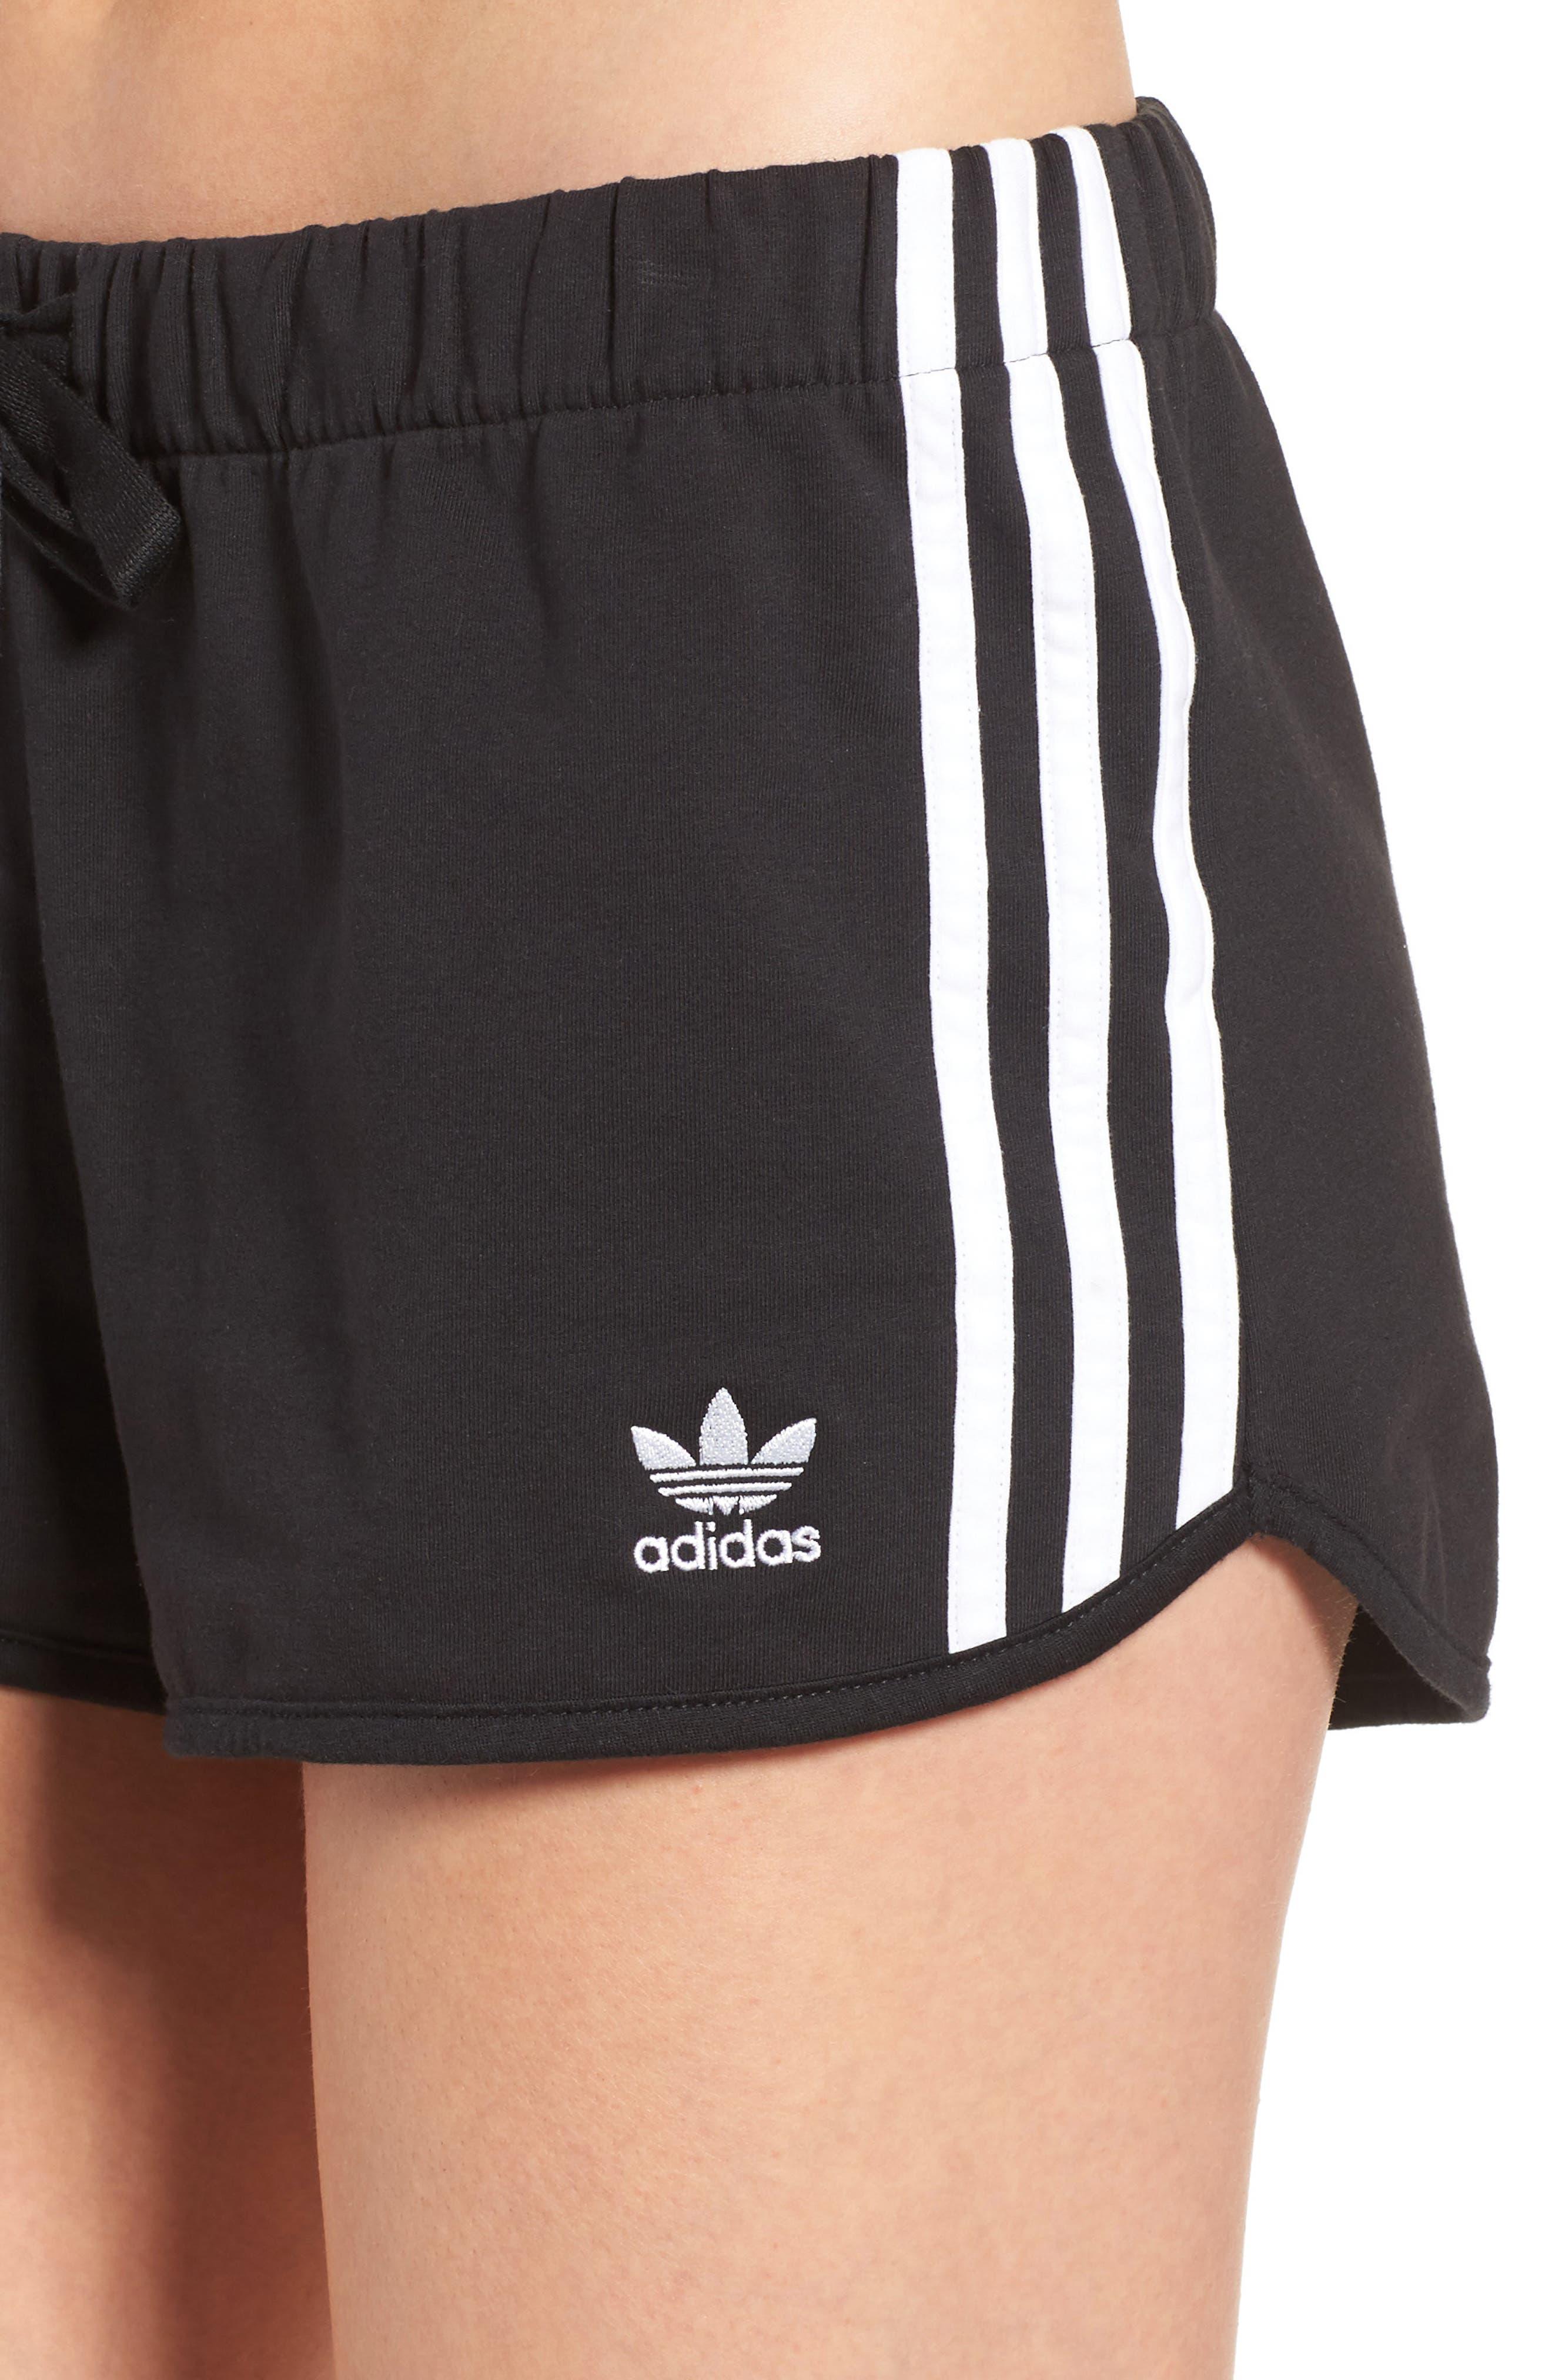 Originals Slim Fit Shorts,                             Alternate thumbnail 4, color,                             001